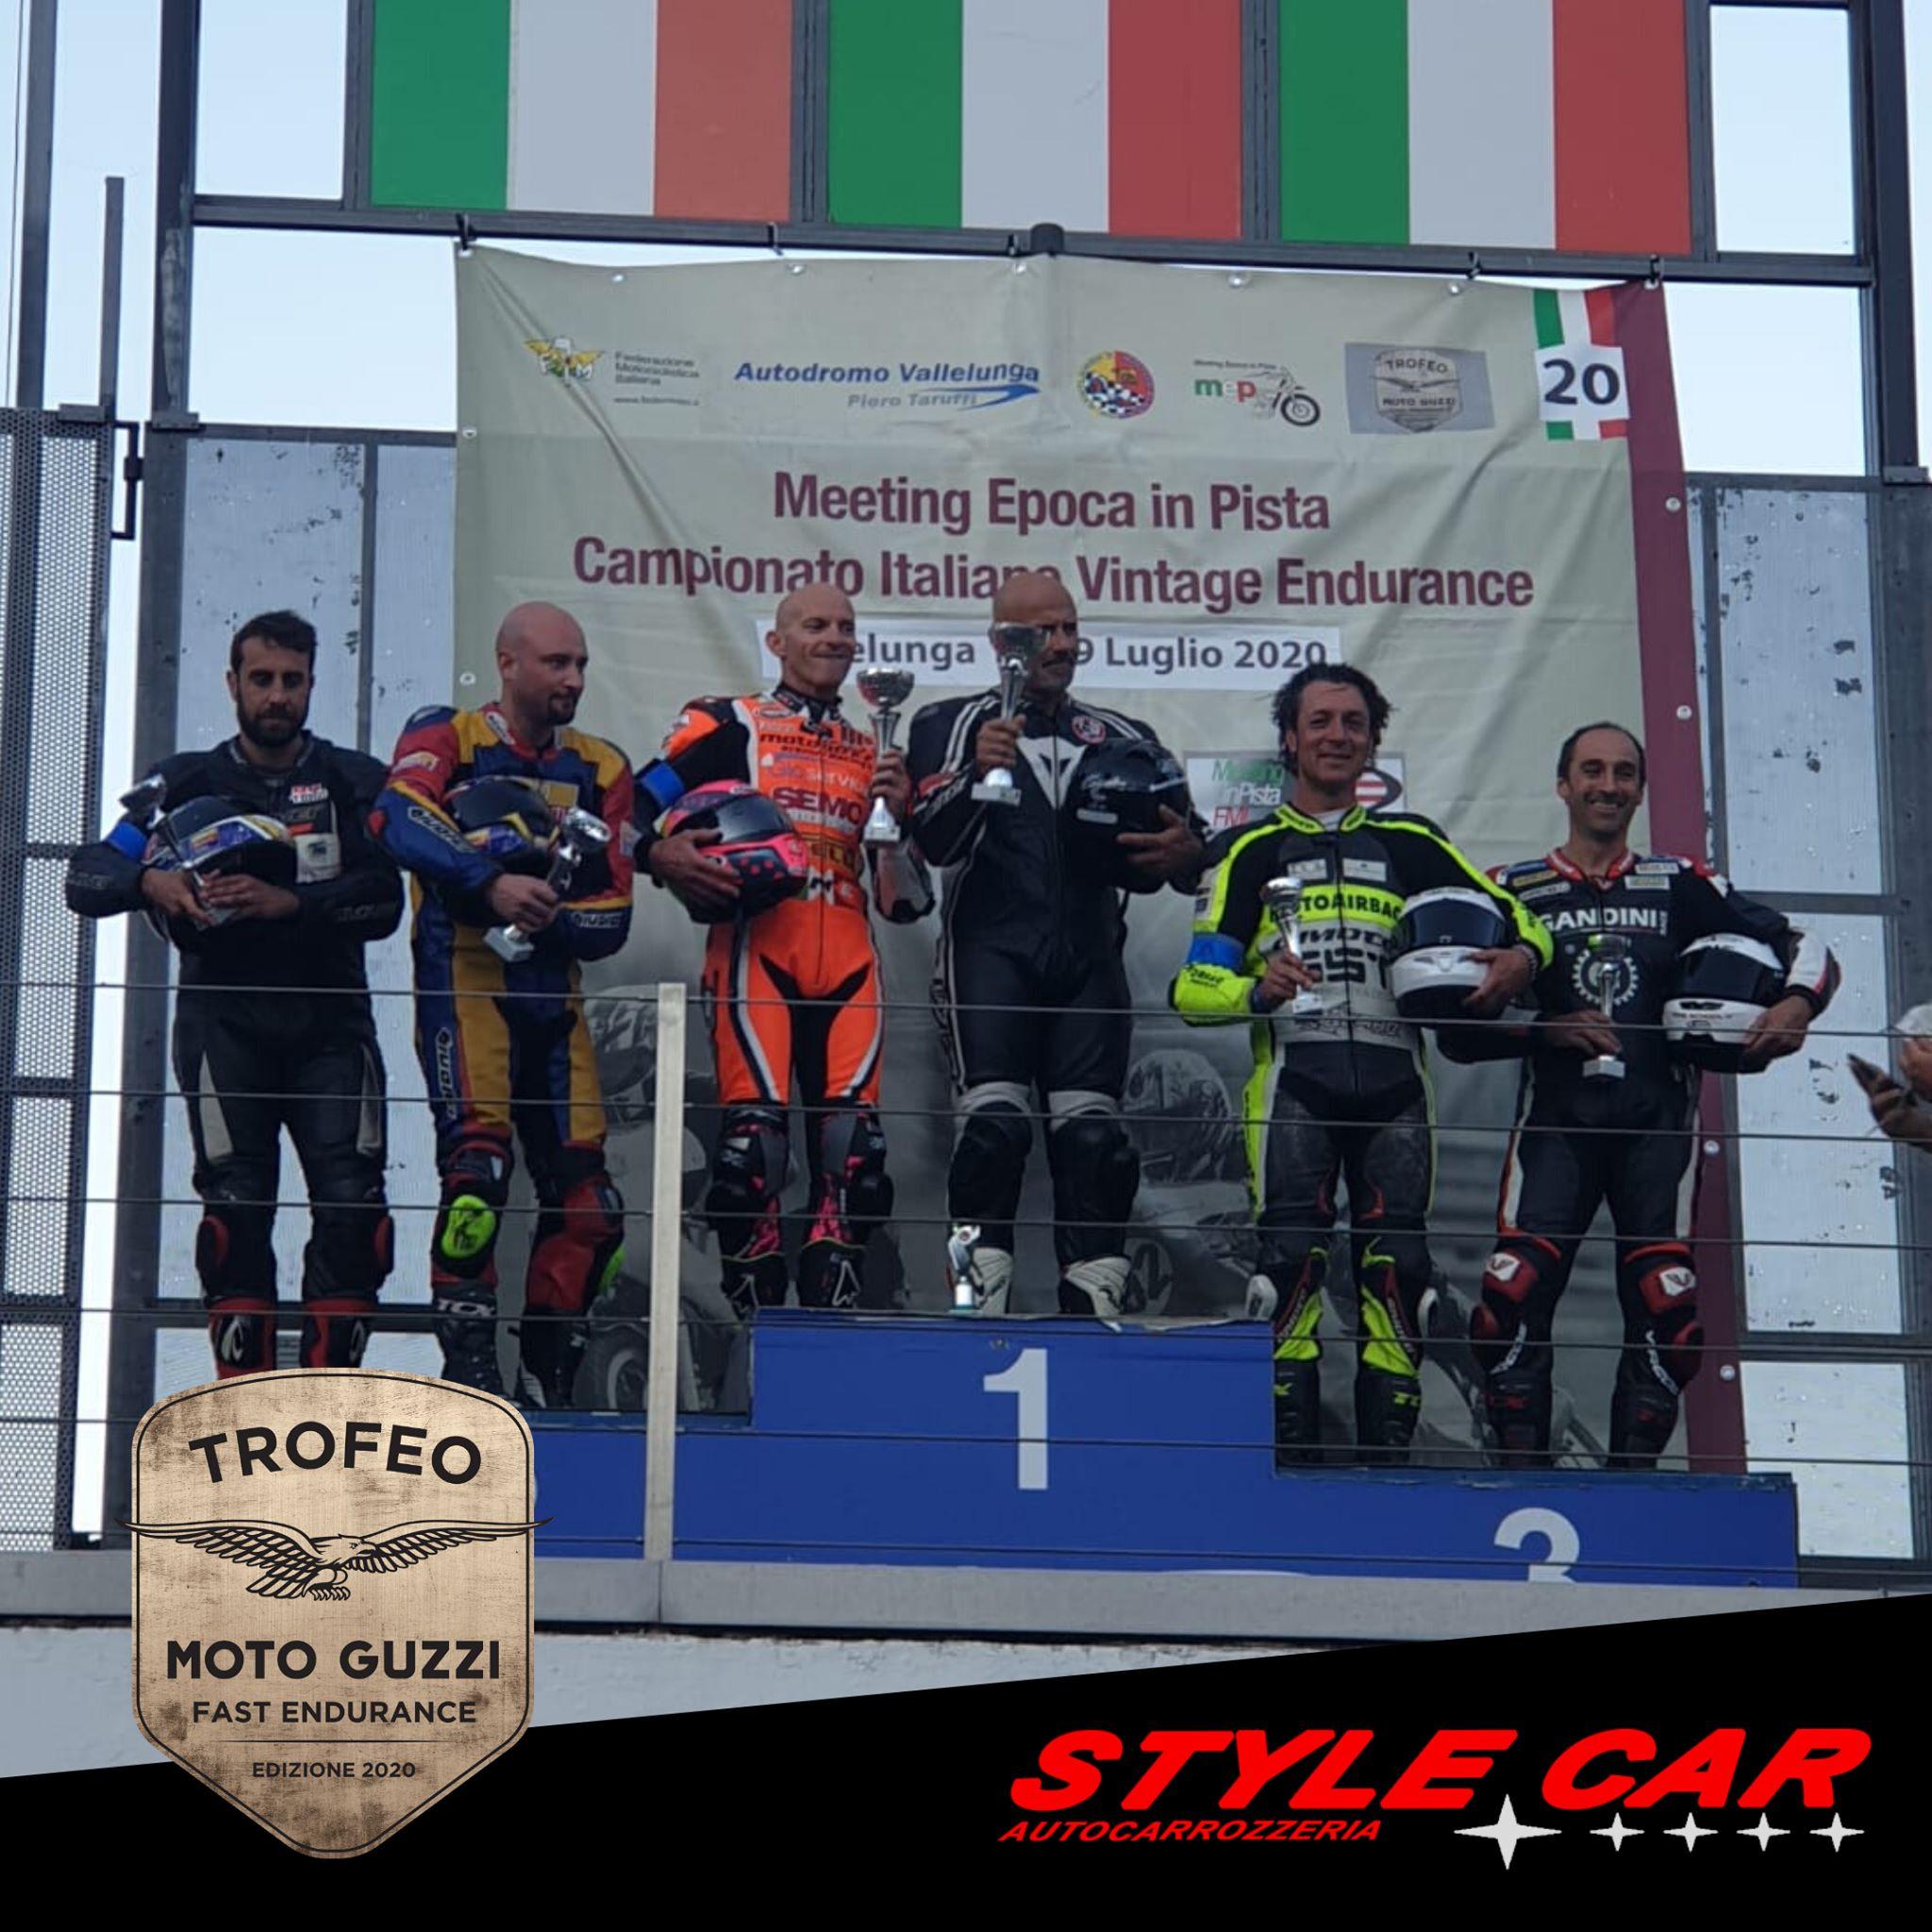 stylecar-motoguzzi-luglio3